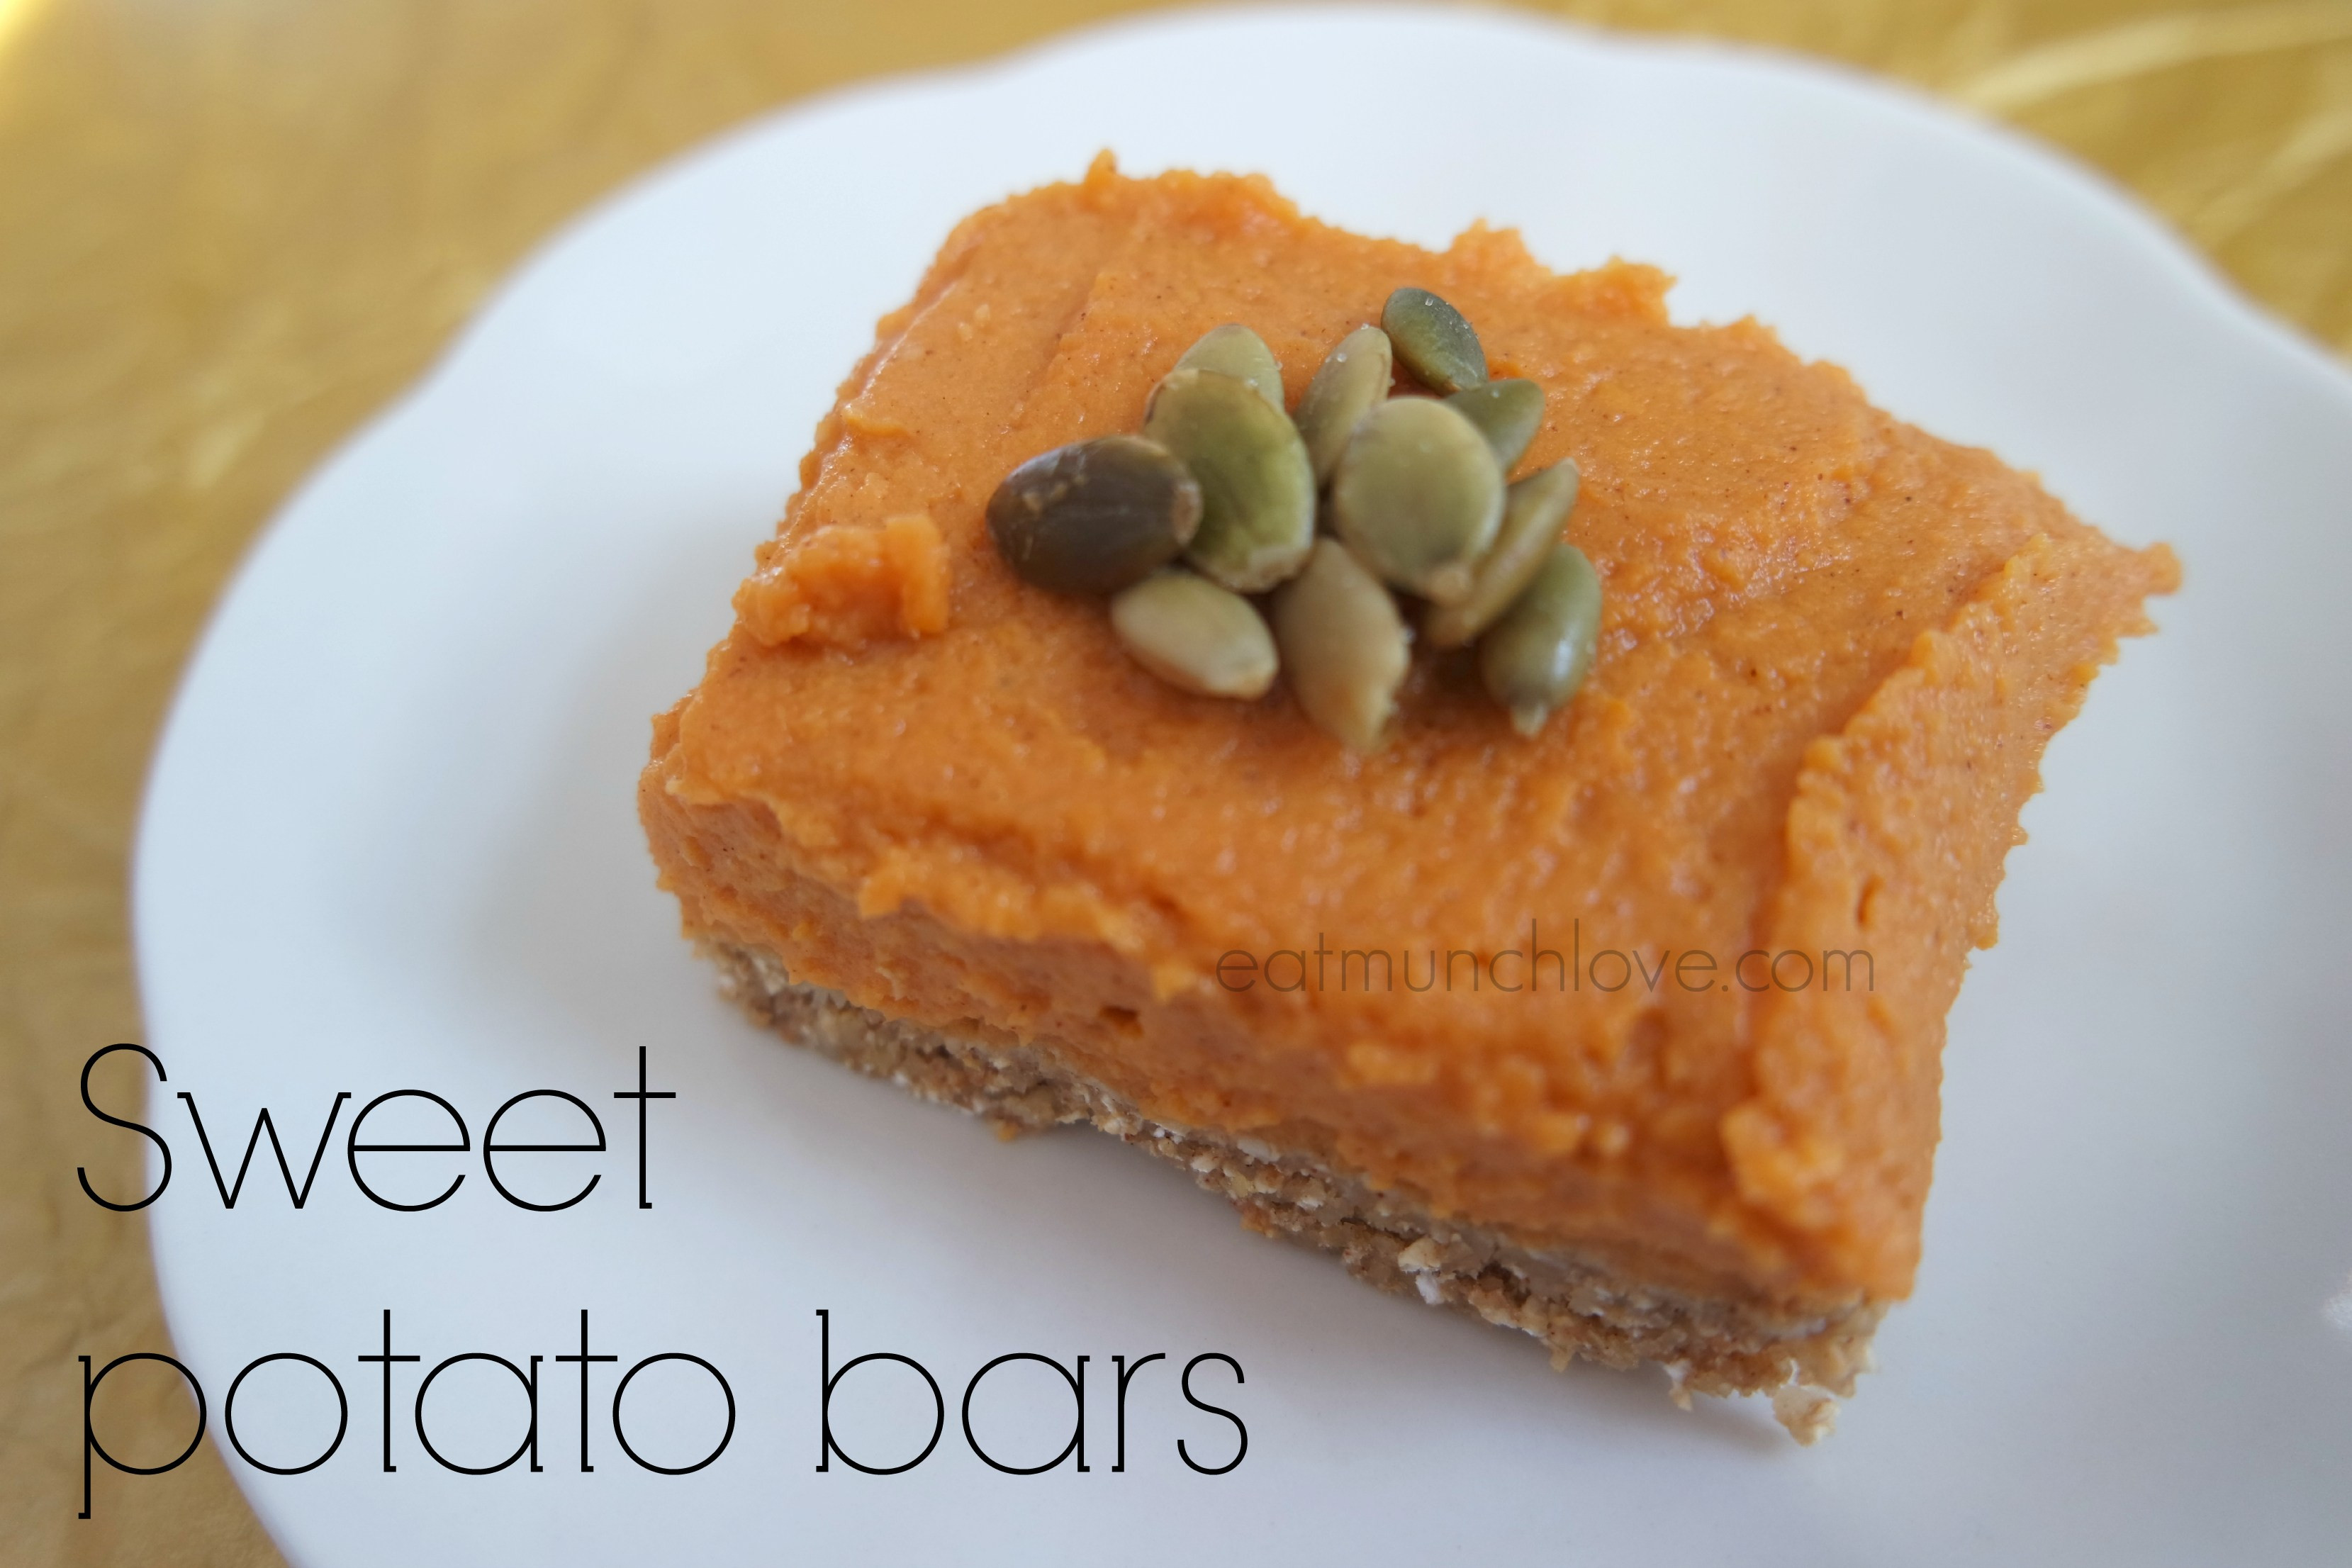 Sweet Potatoes Dessert Recipe  No bake sweet potato bars gluten free vegan refined